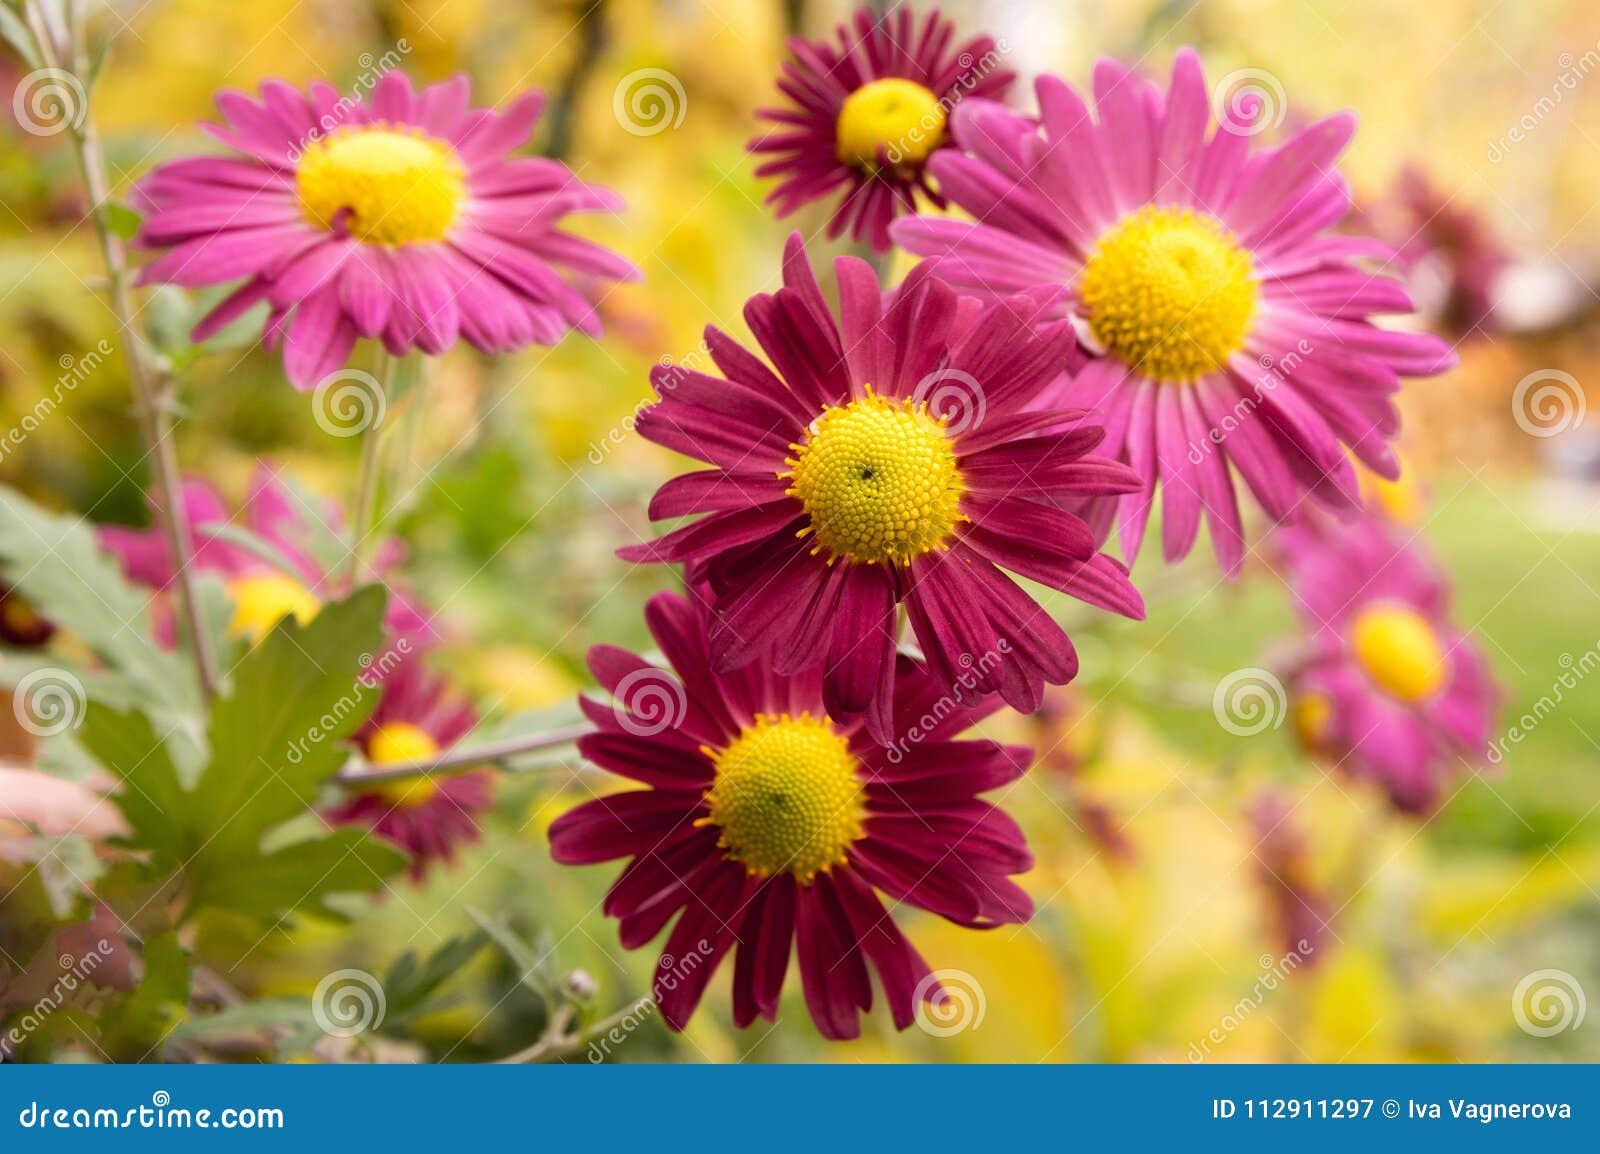 Chrysanthemum Indicum Mum Flowers In Bloom Stock Image Image Of